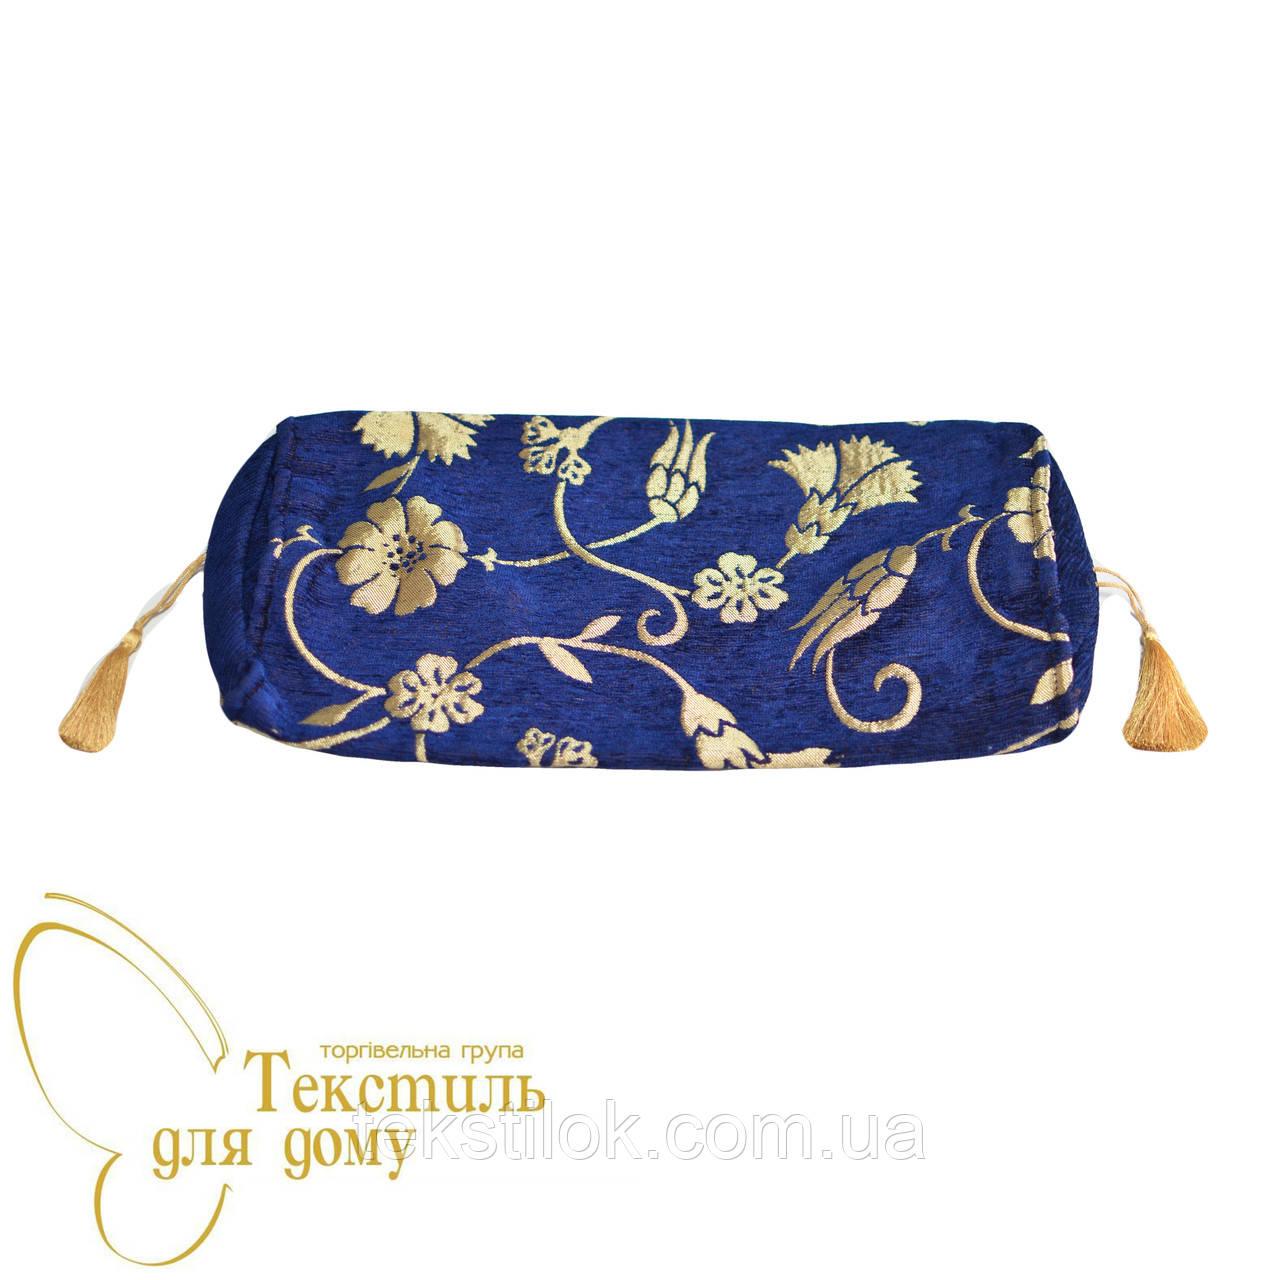 Наволочка декоративная валик с золотым цветком ANTIK KARANFIL, синий